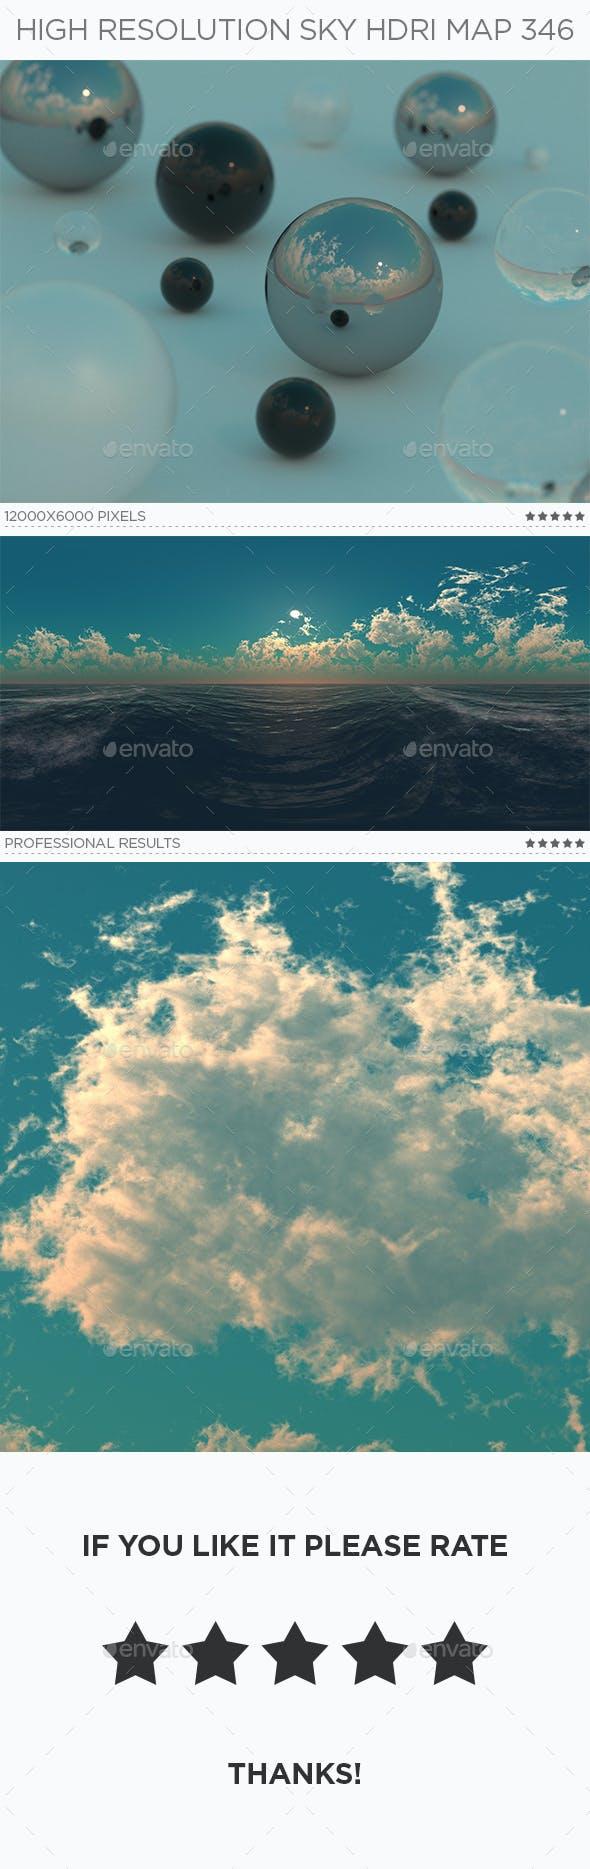 High Resolution Sky HDRi Map 346 - 3DOcean Item for Sale